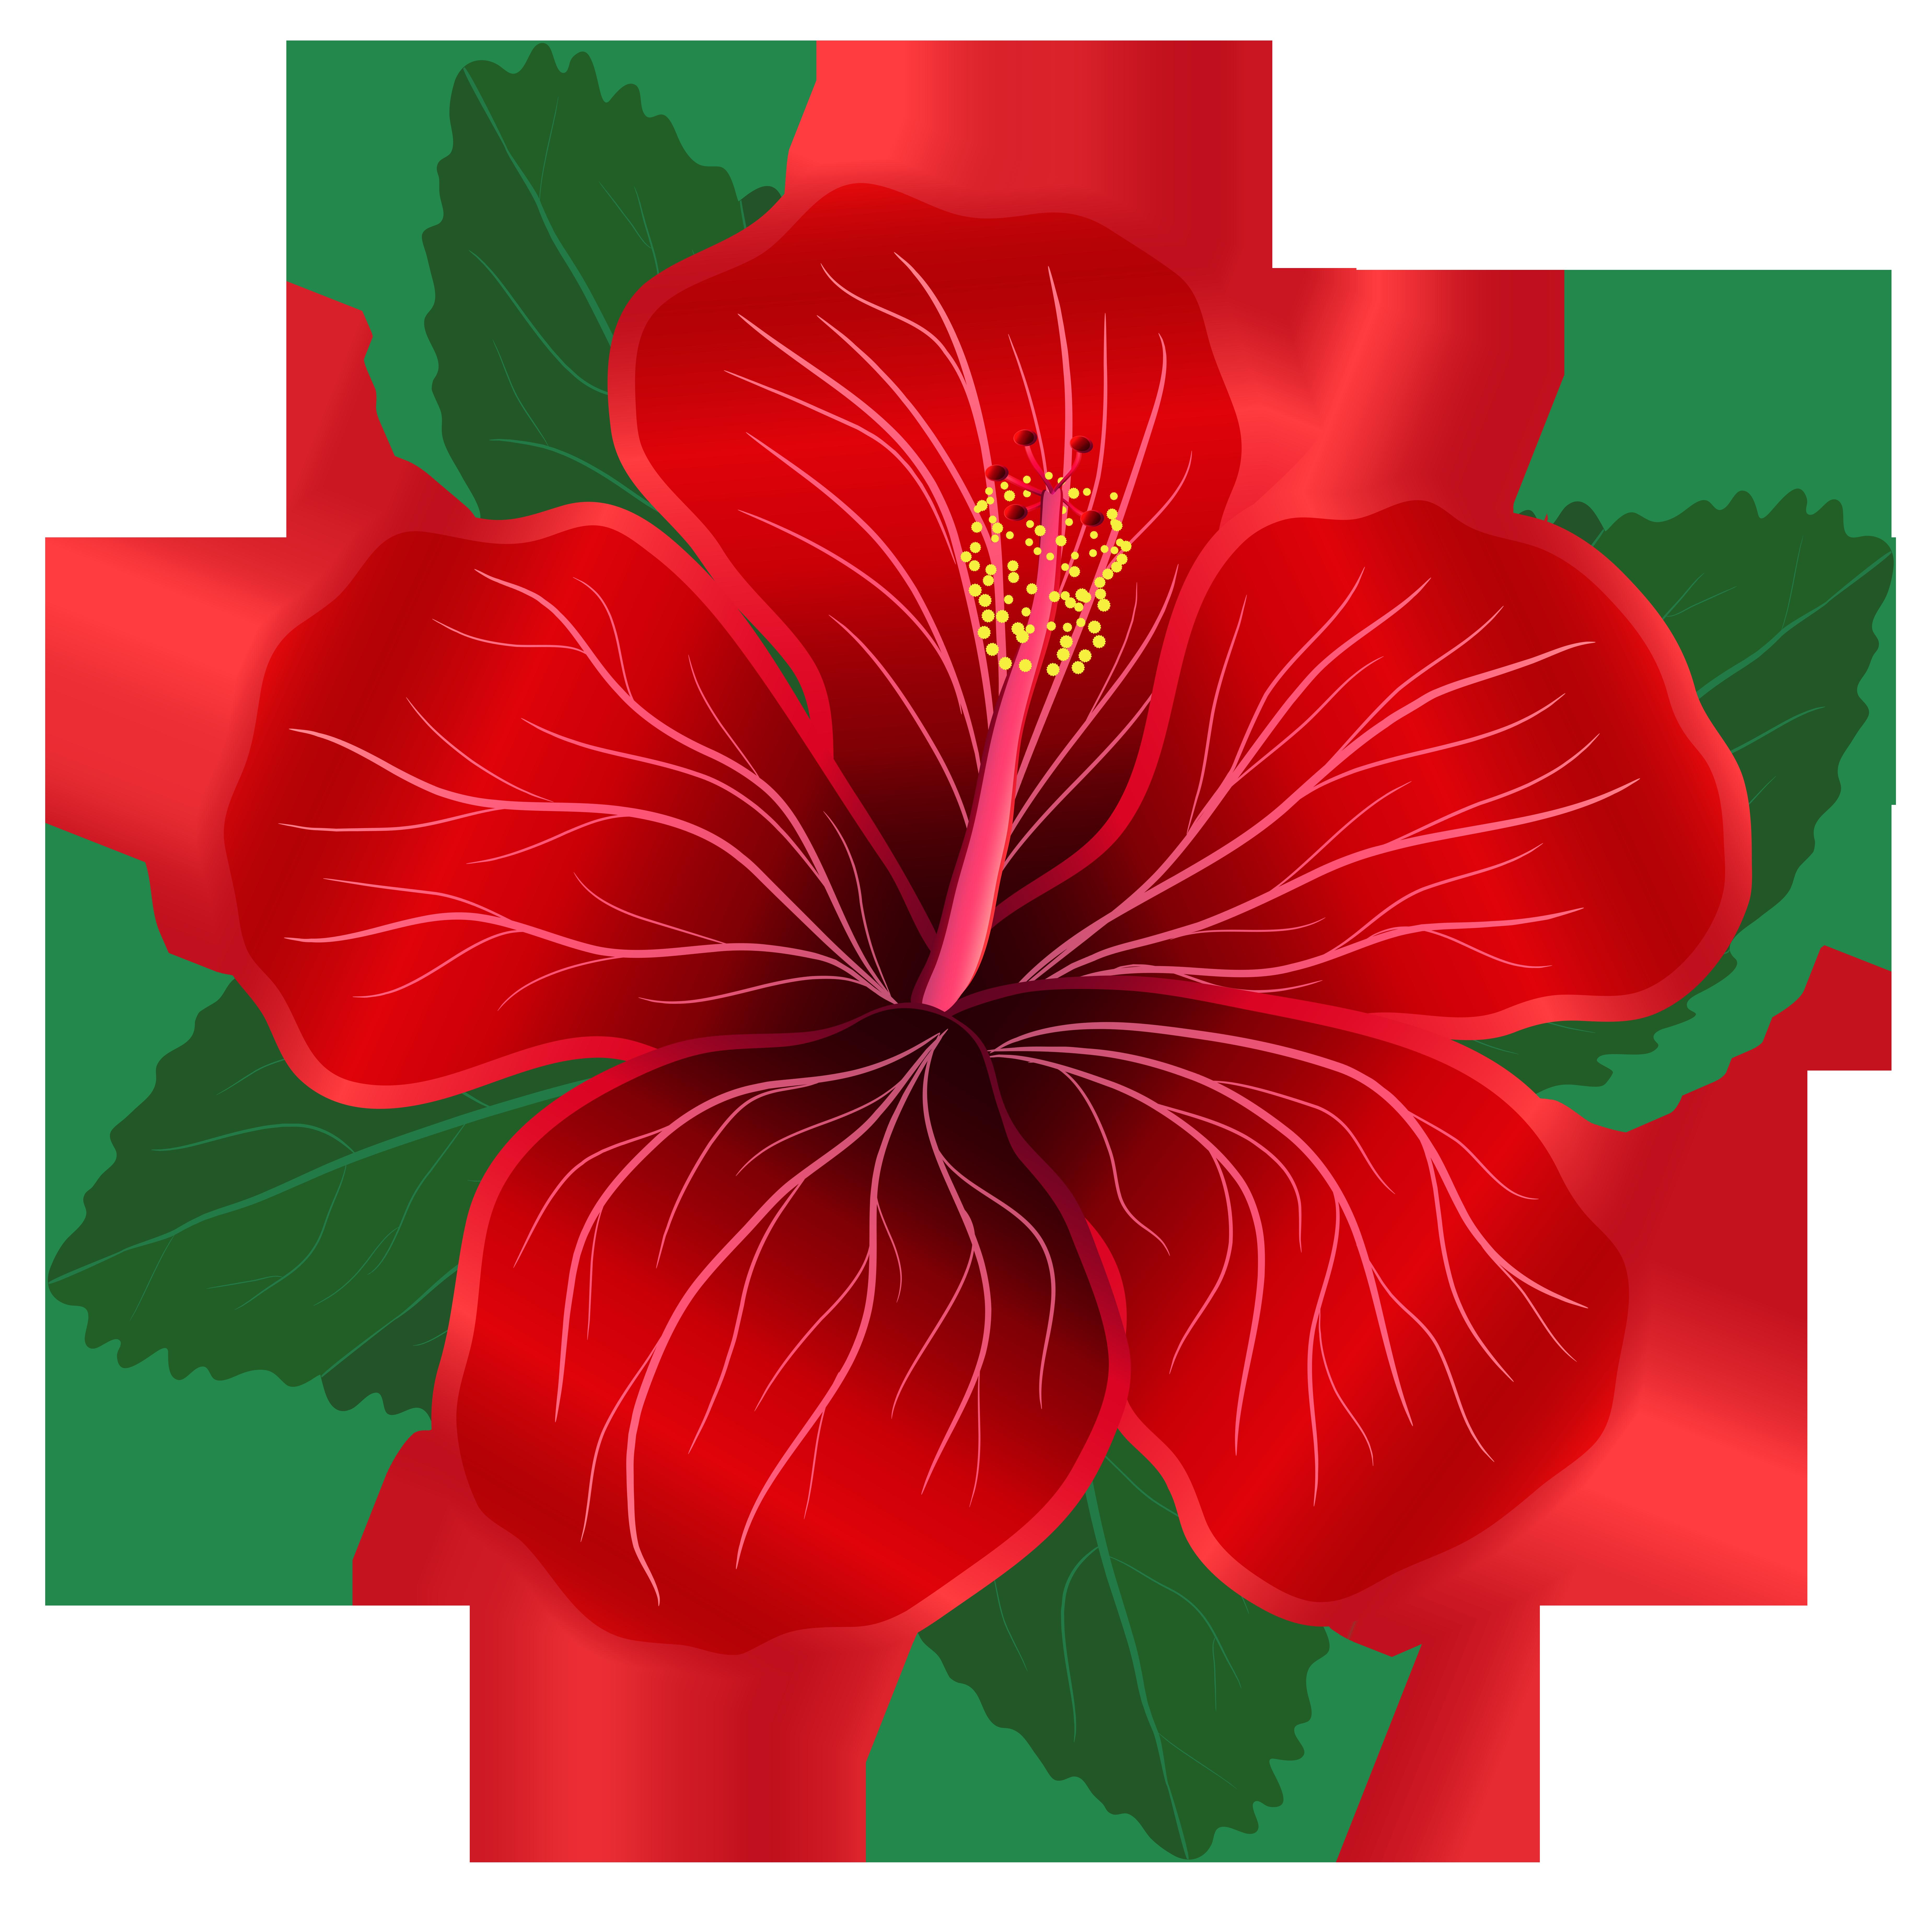 Red Flower Clipart - Tumundografico